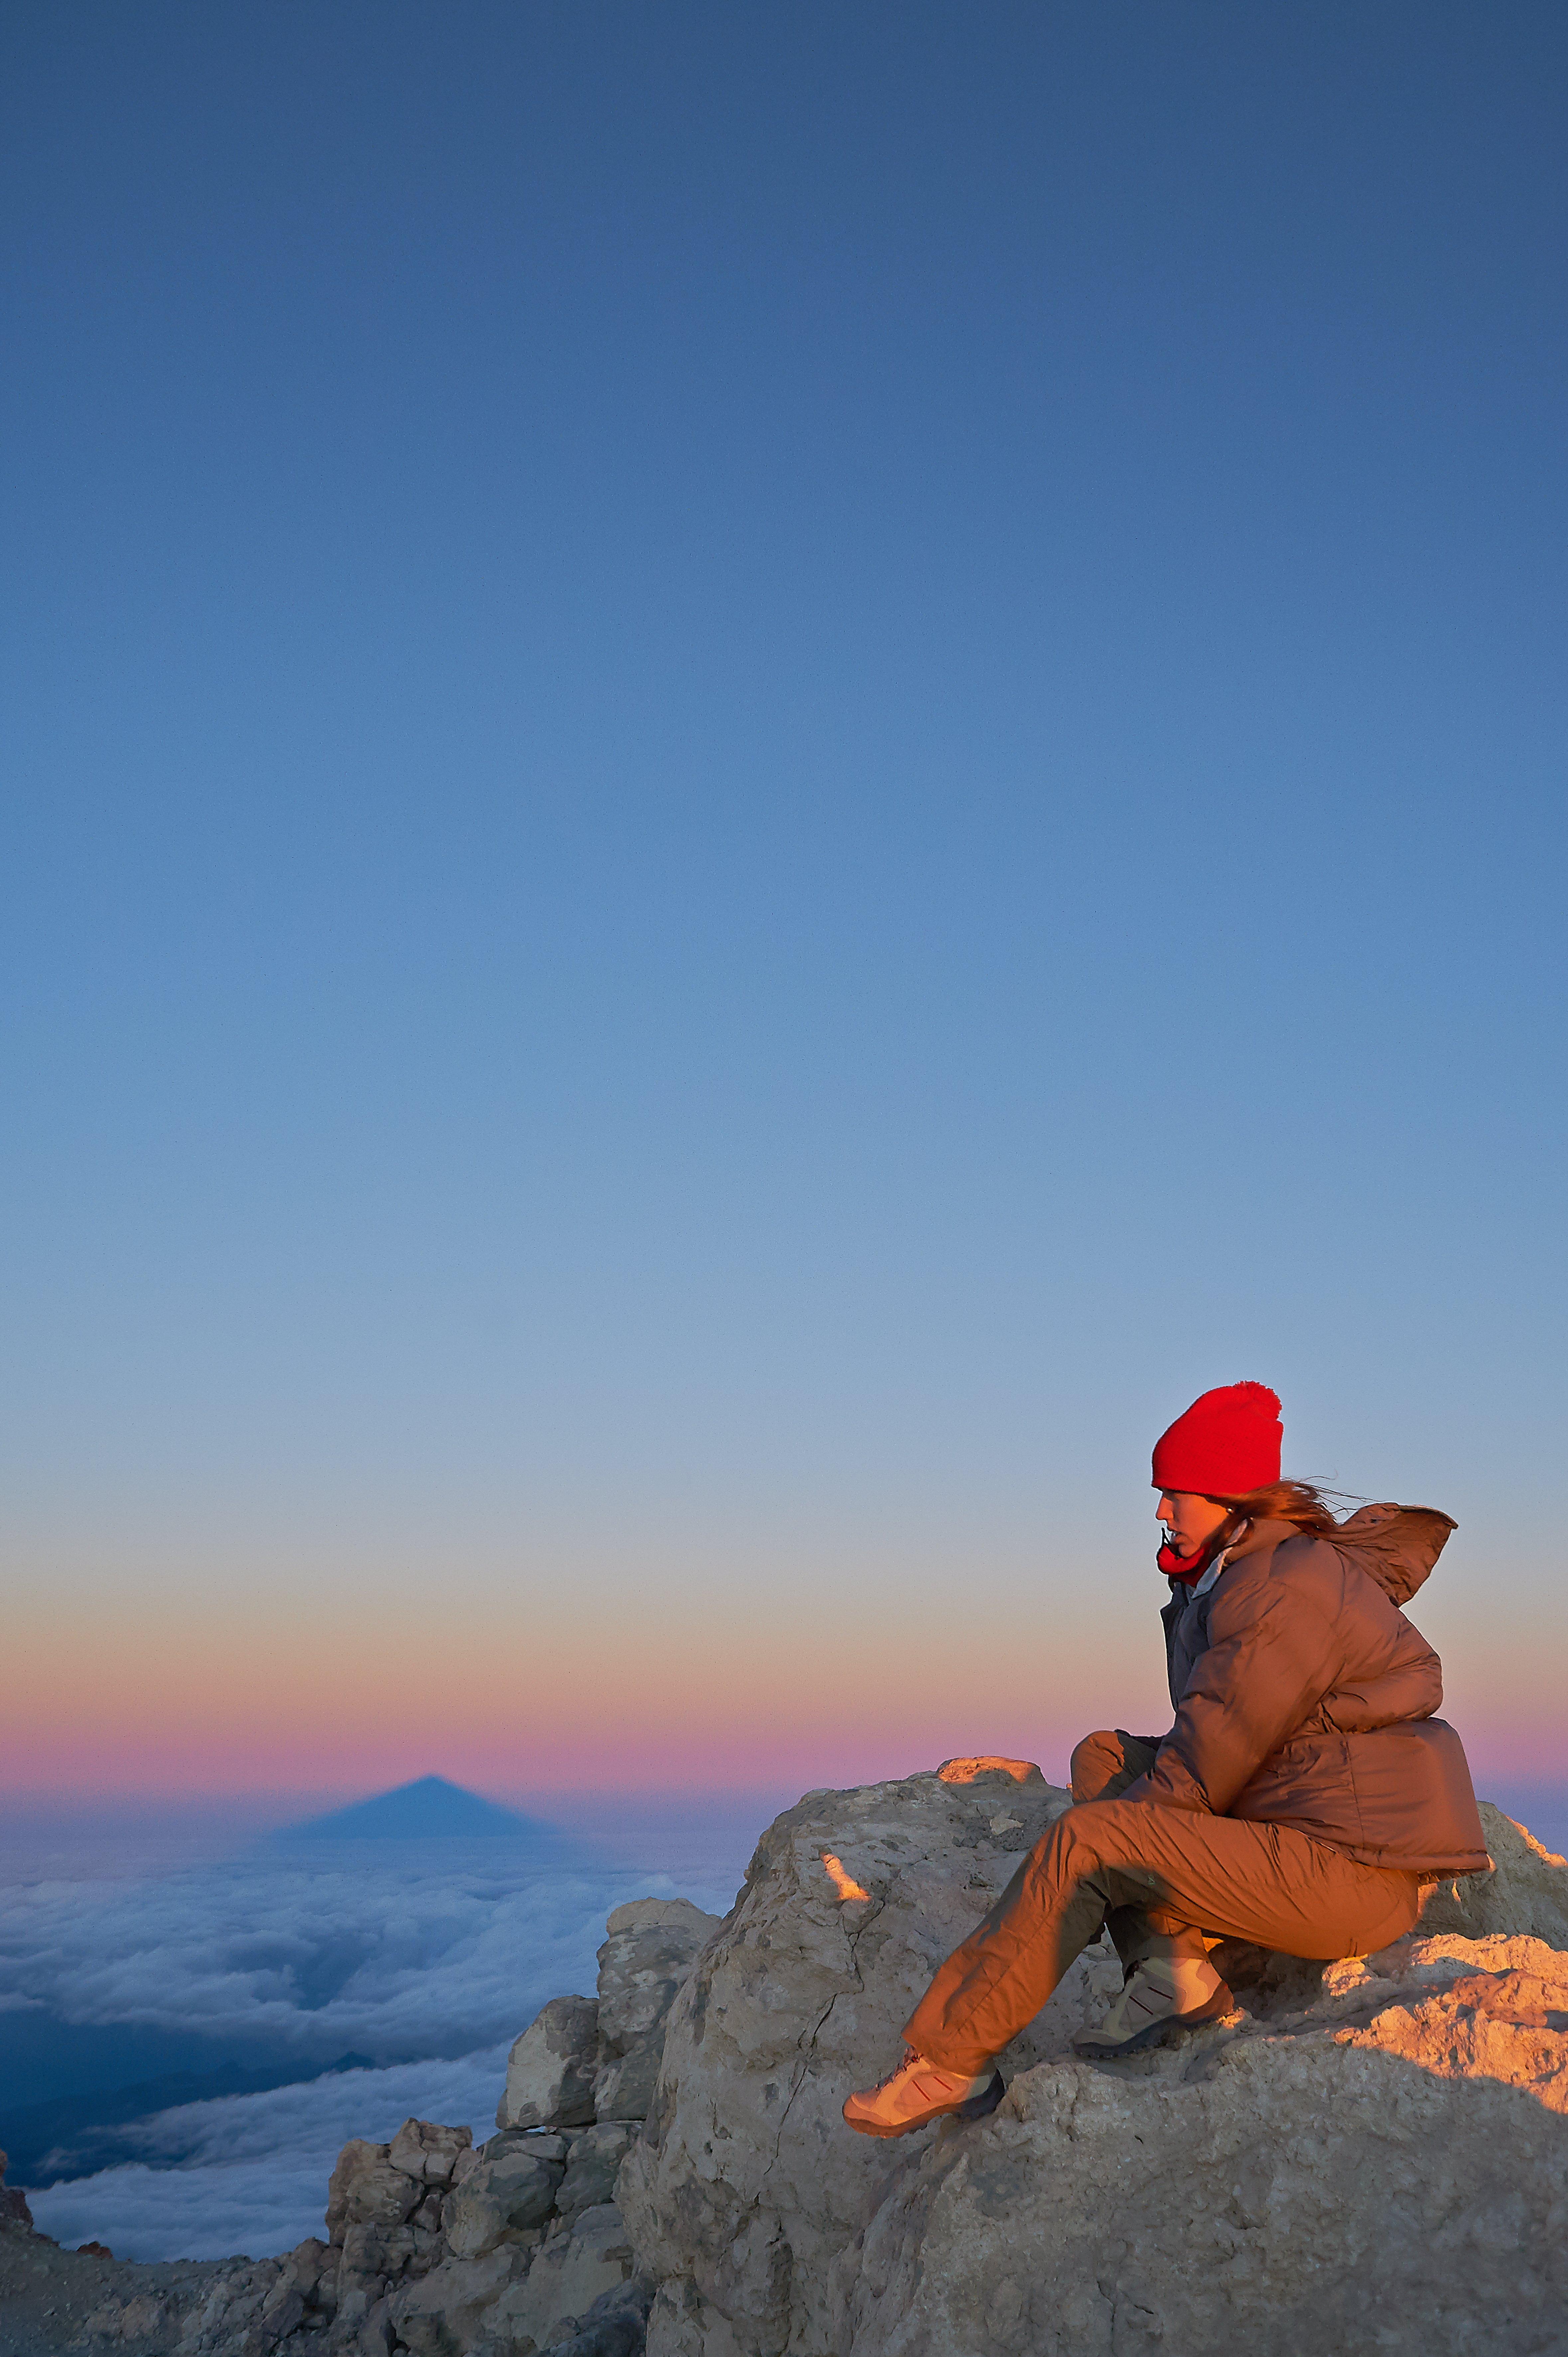 Climbing Mount Teide: sunrise at the peak